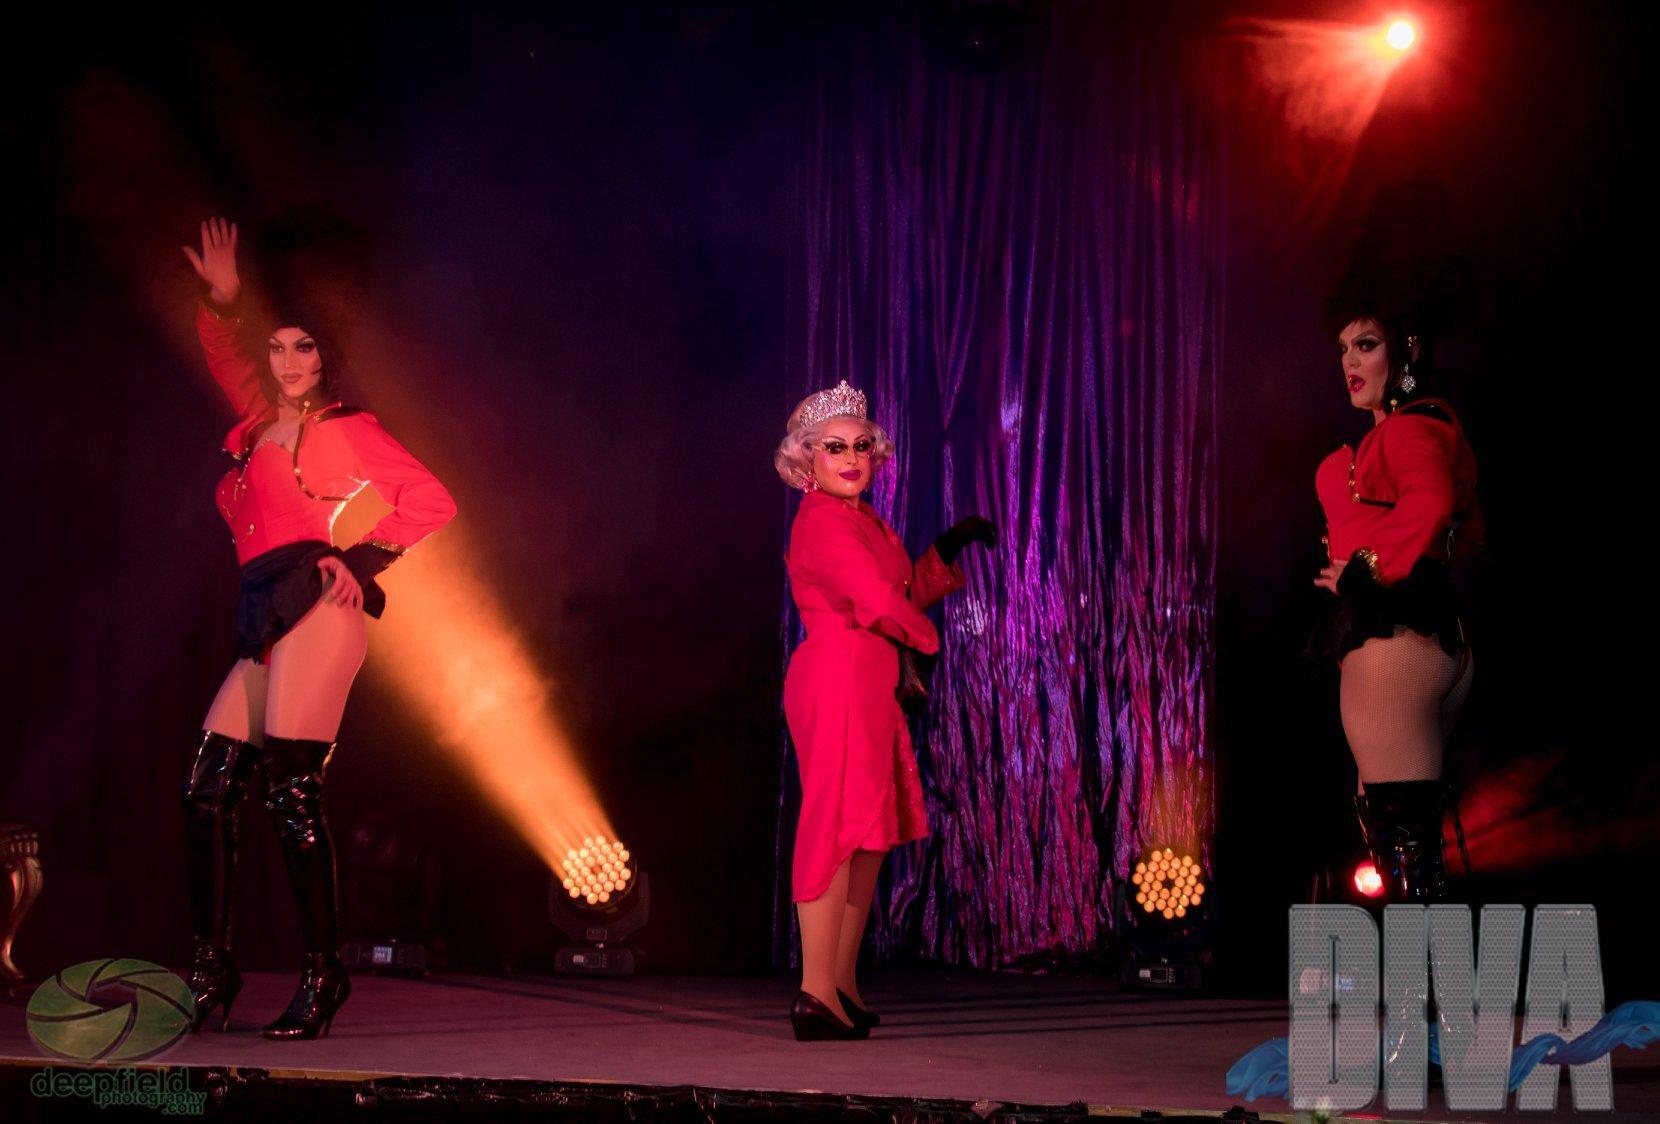 brits-n-pieces-hannah-conda-carmen-geddit-sia-tequila-diva-awards-sydney-drag-queen-royalty-best-hire-drag-race-australia-7.jpg